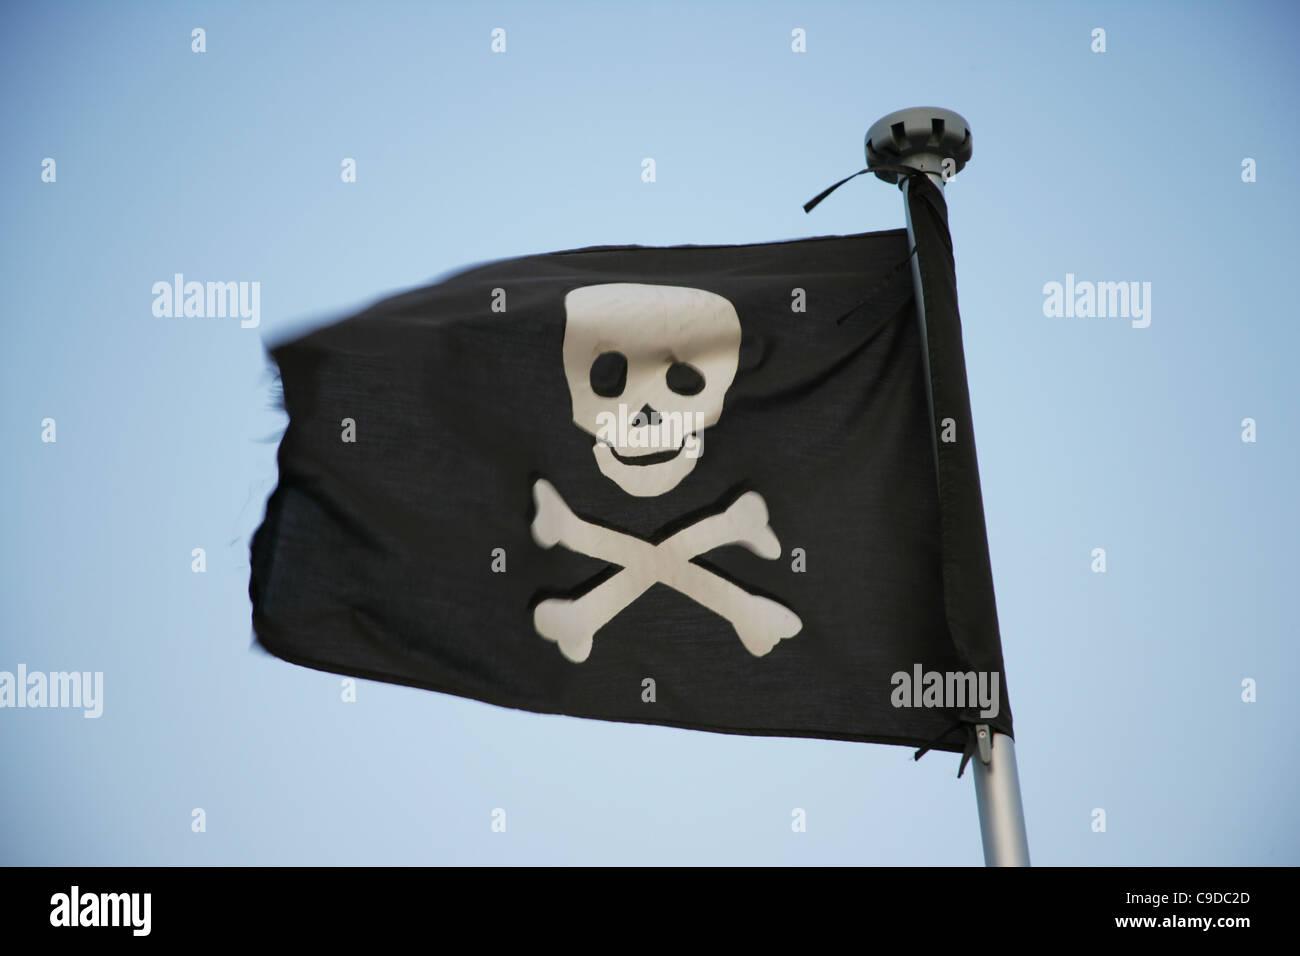 Jolly Roger waving. - Stock Image